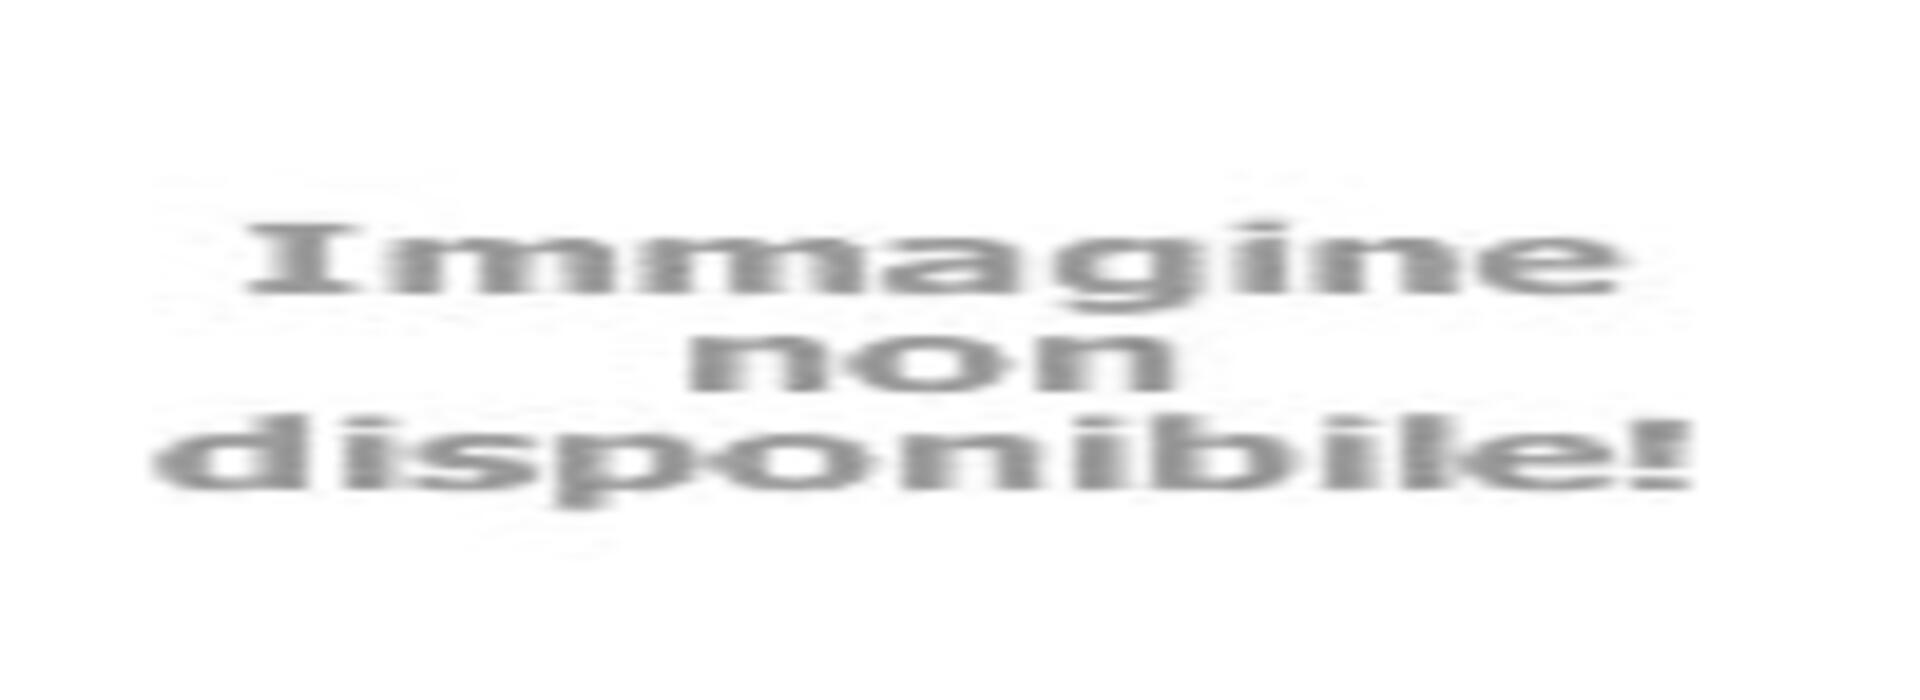 hotel-montecarlo hu vendeglatas 019